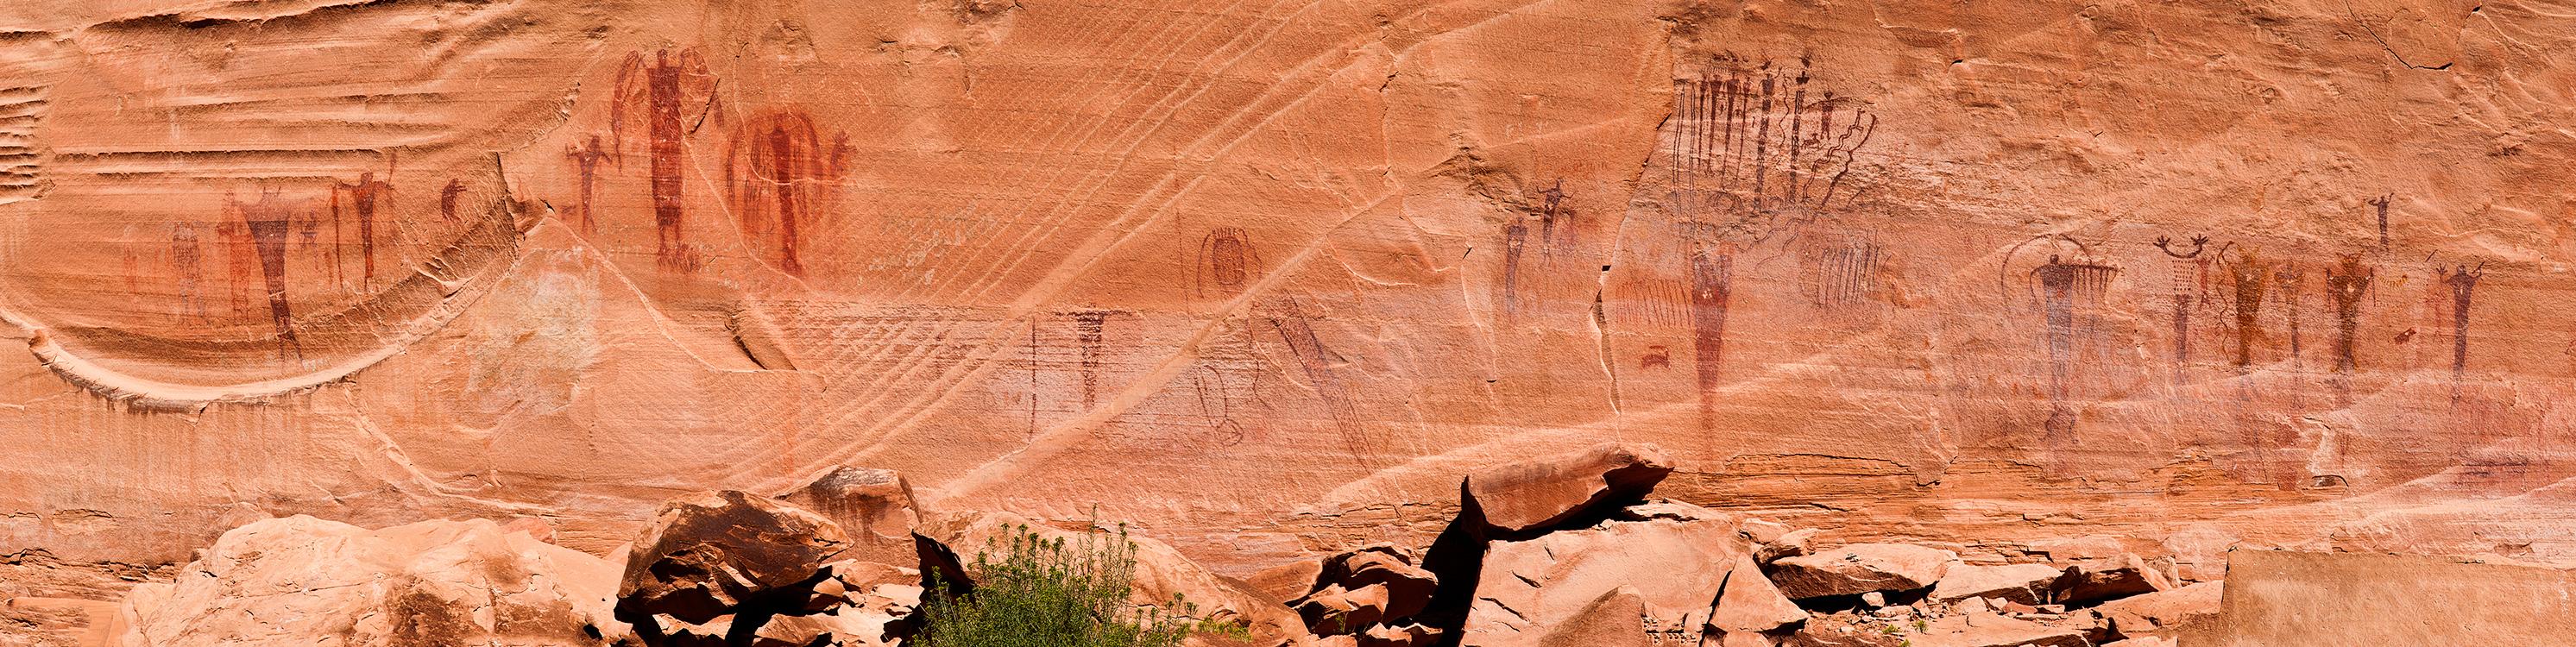 pan37:  The Buckhorn Wash pictograph panel; San Rafael Swell, central Utah